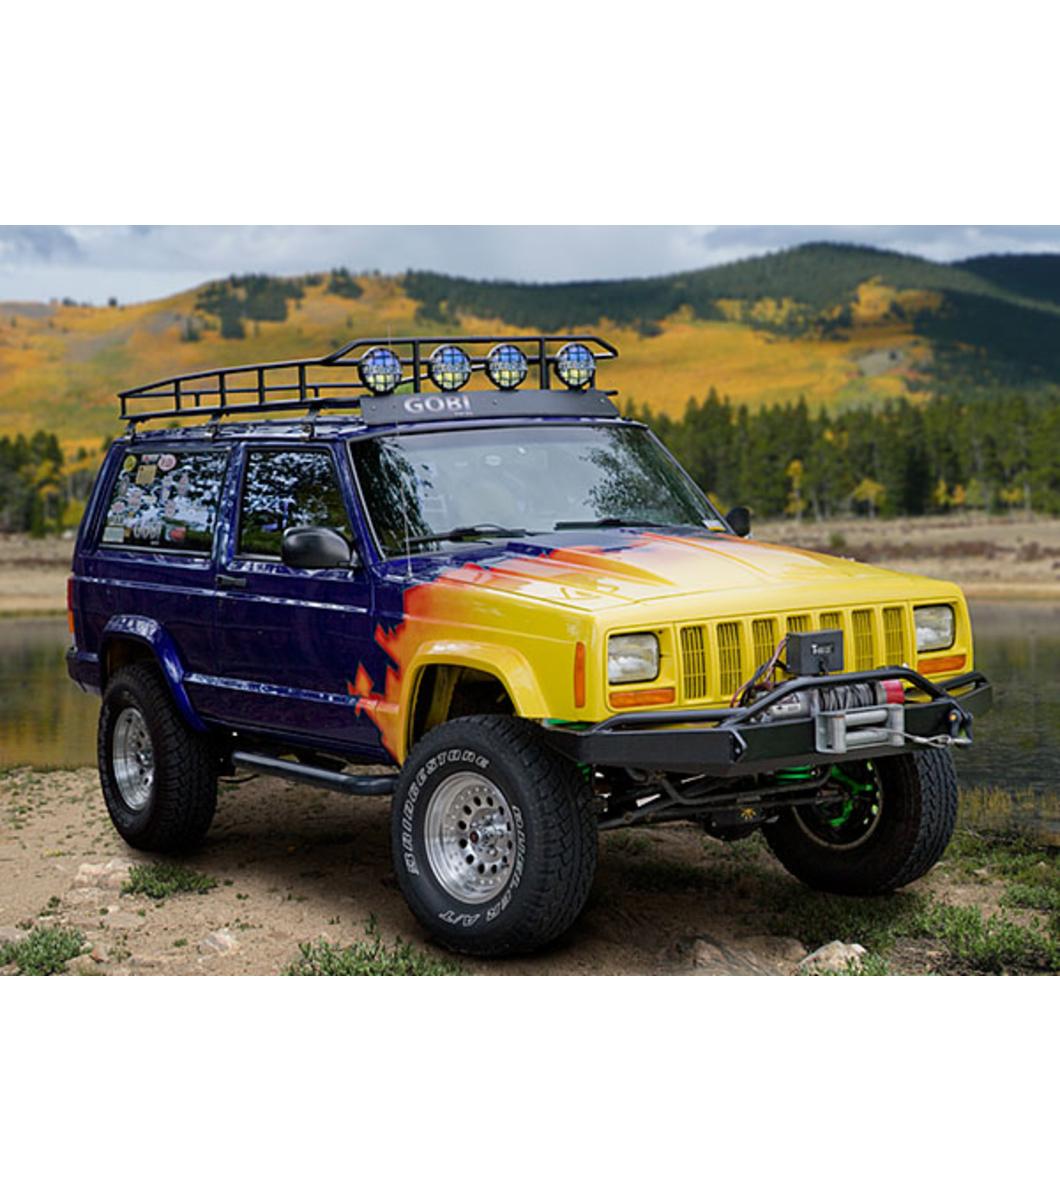 Jeep Cherokee Xj 183 Ranger Rack 183 Multi Light Setup 183 No